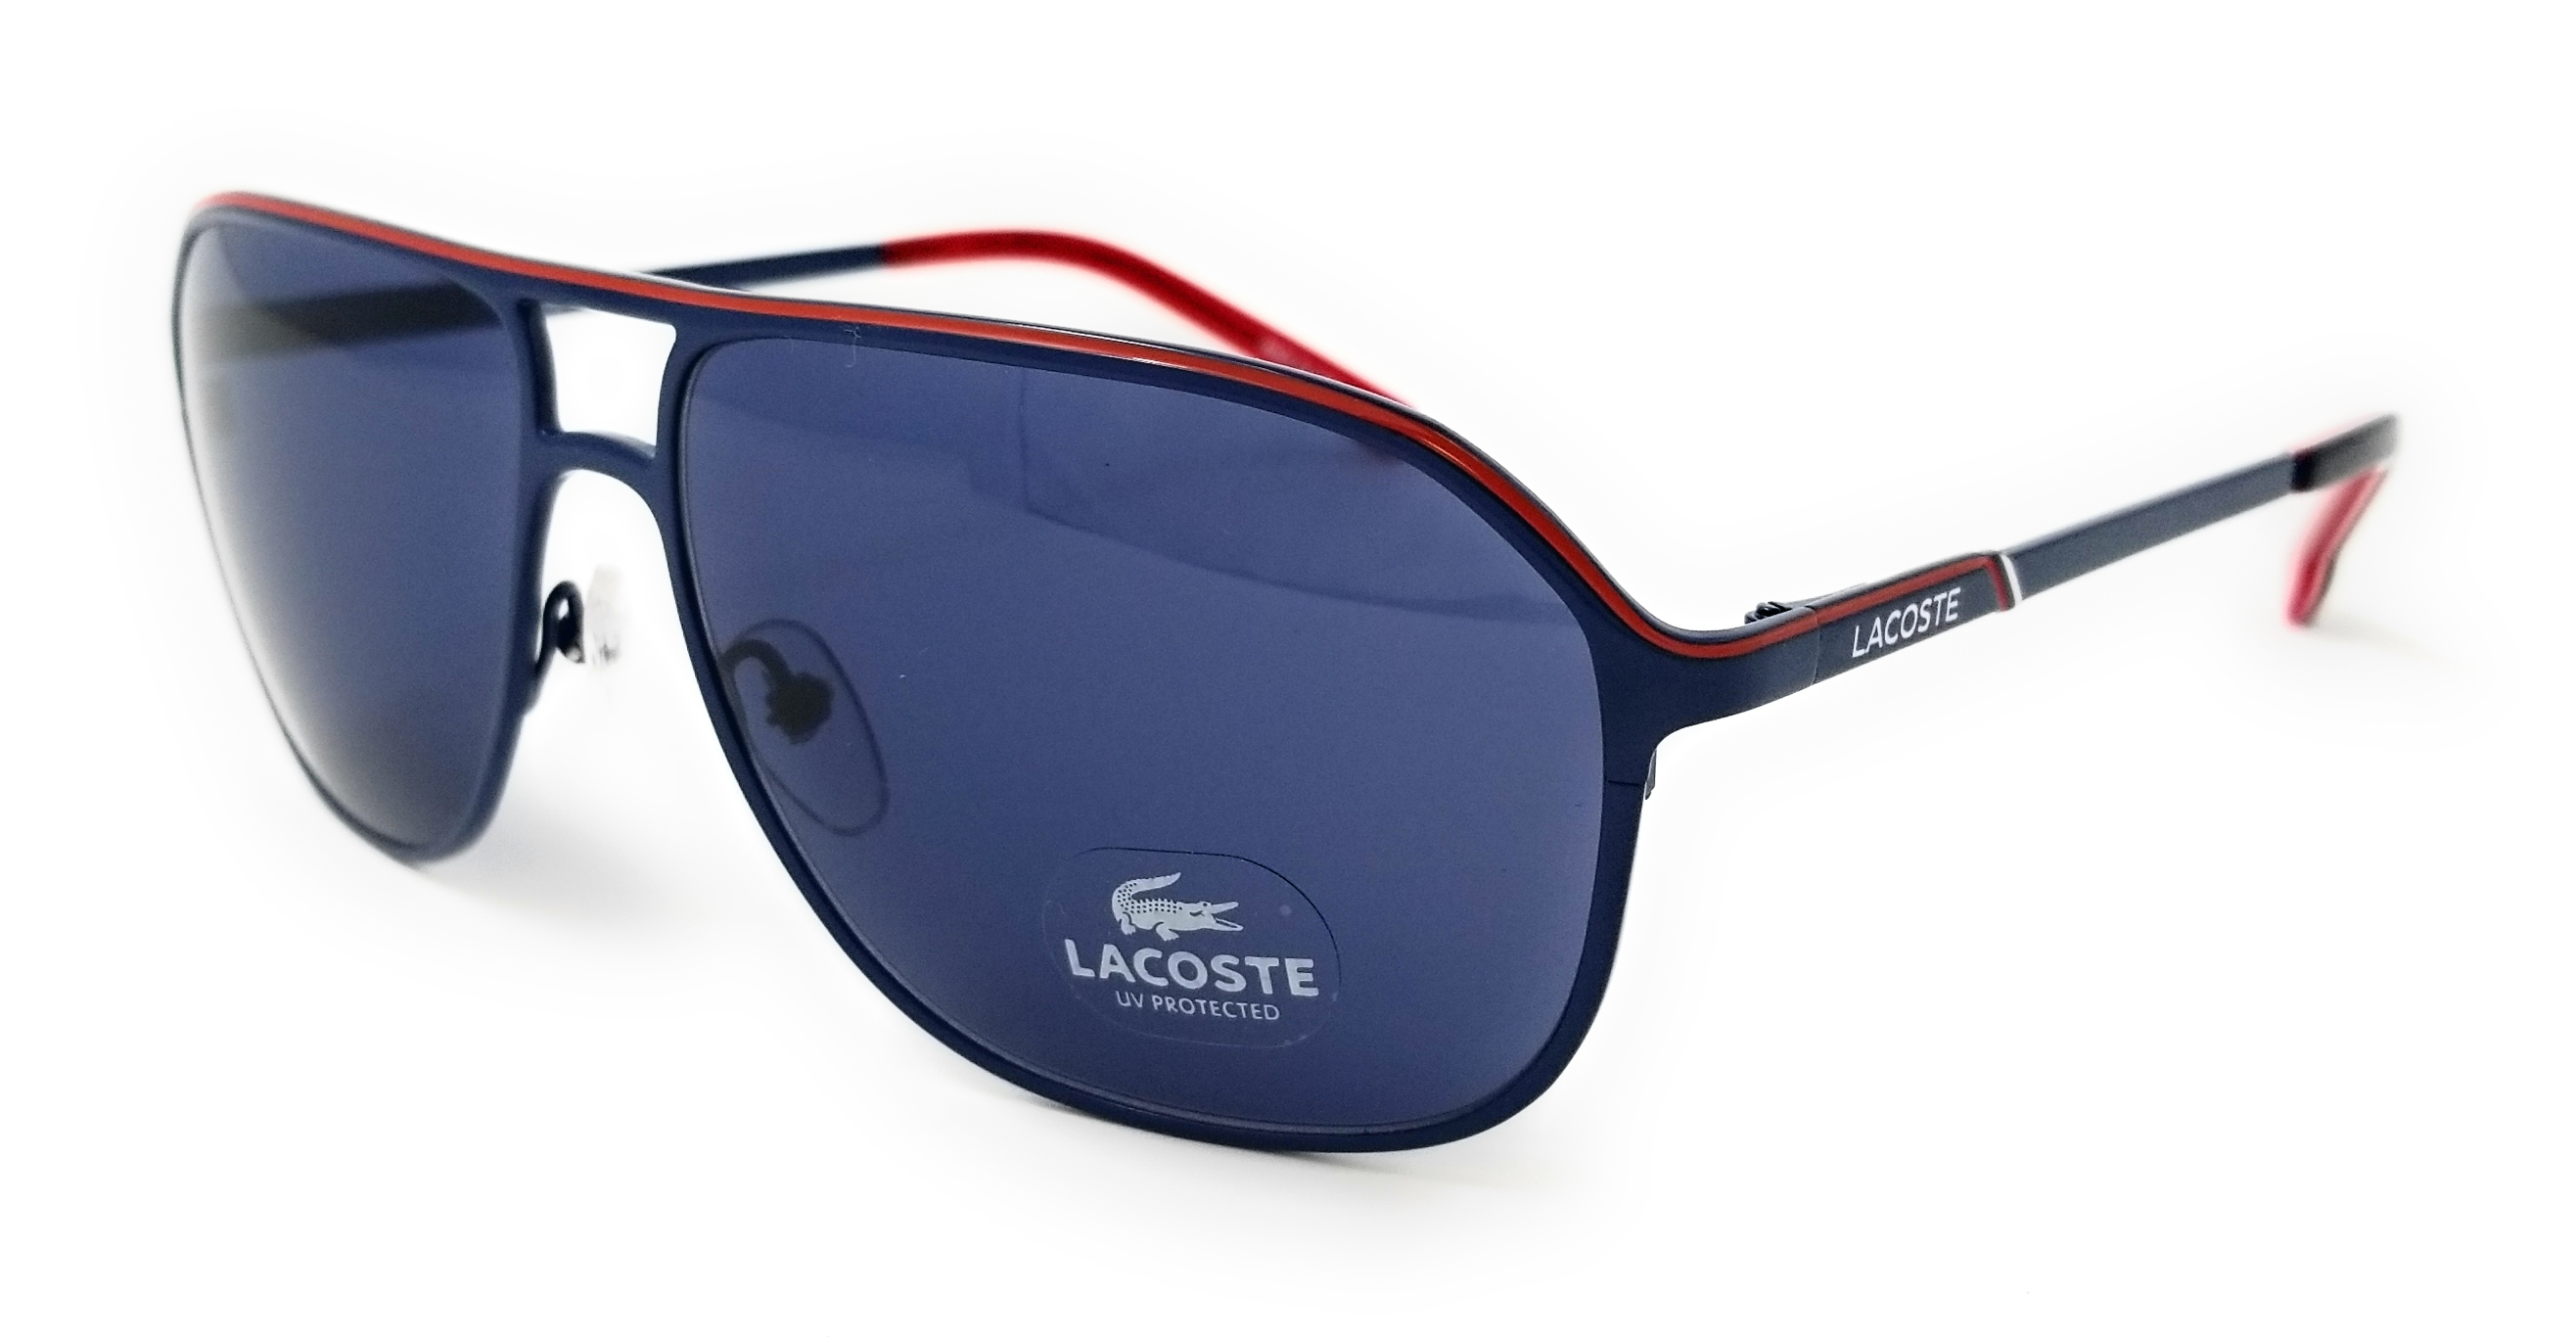 23756b85a743 Lacoste - LACOSTE Sunglasses L139SB 414 Satin Blue Aviator Mens 60x14x140 -  Walmart.com